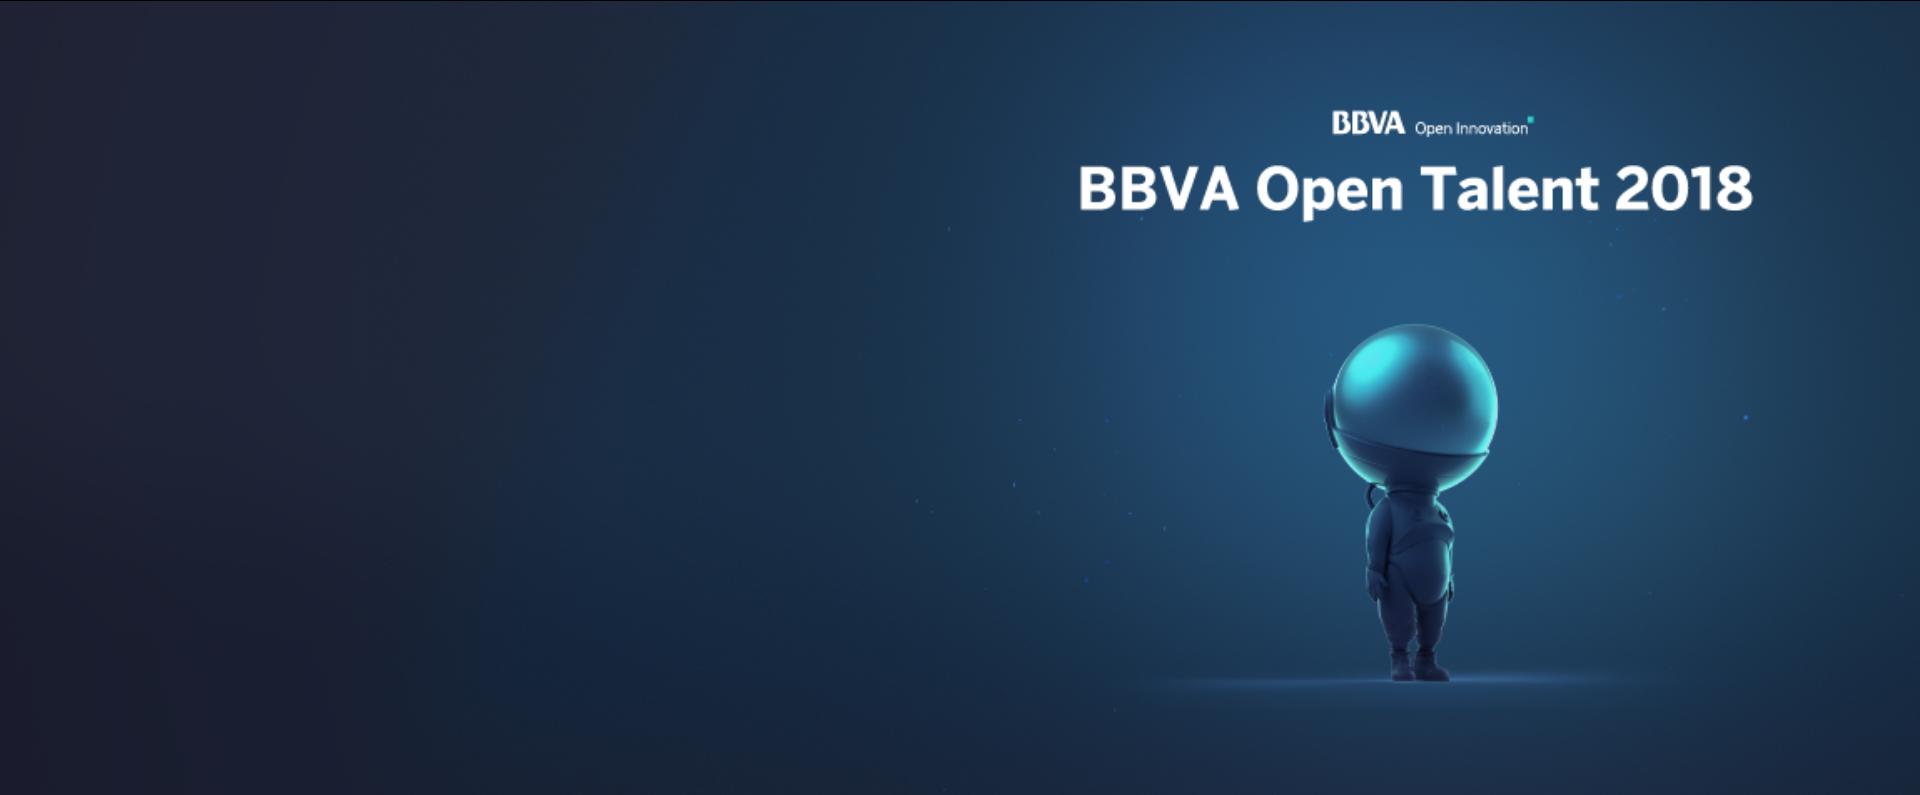 BBVA Open Talent